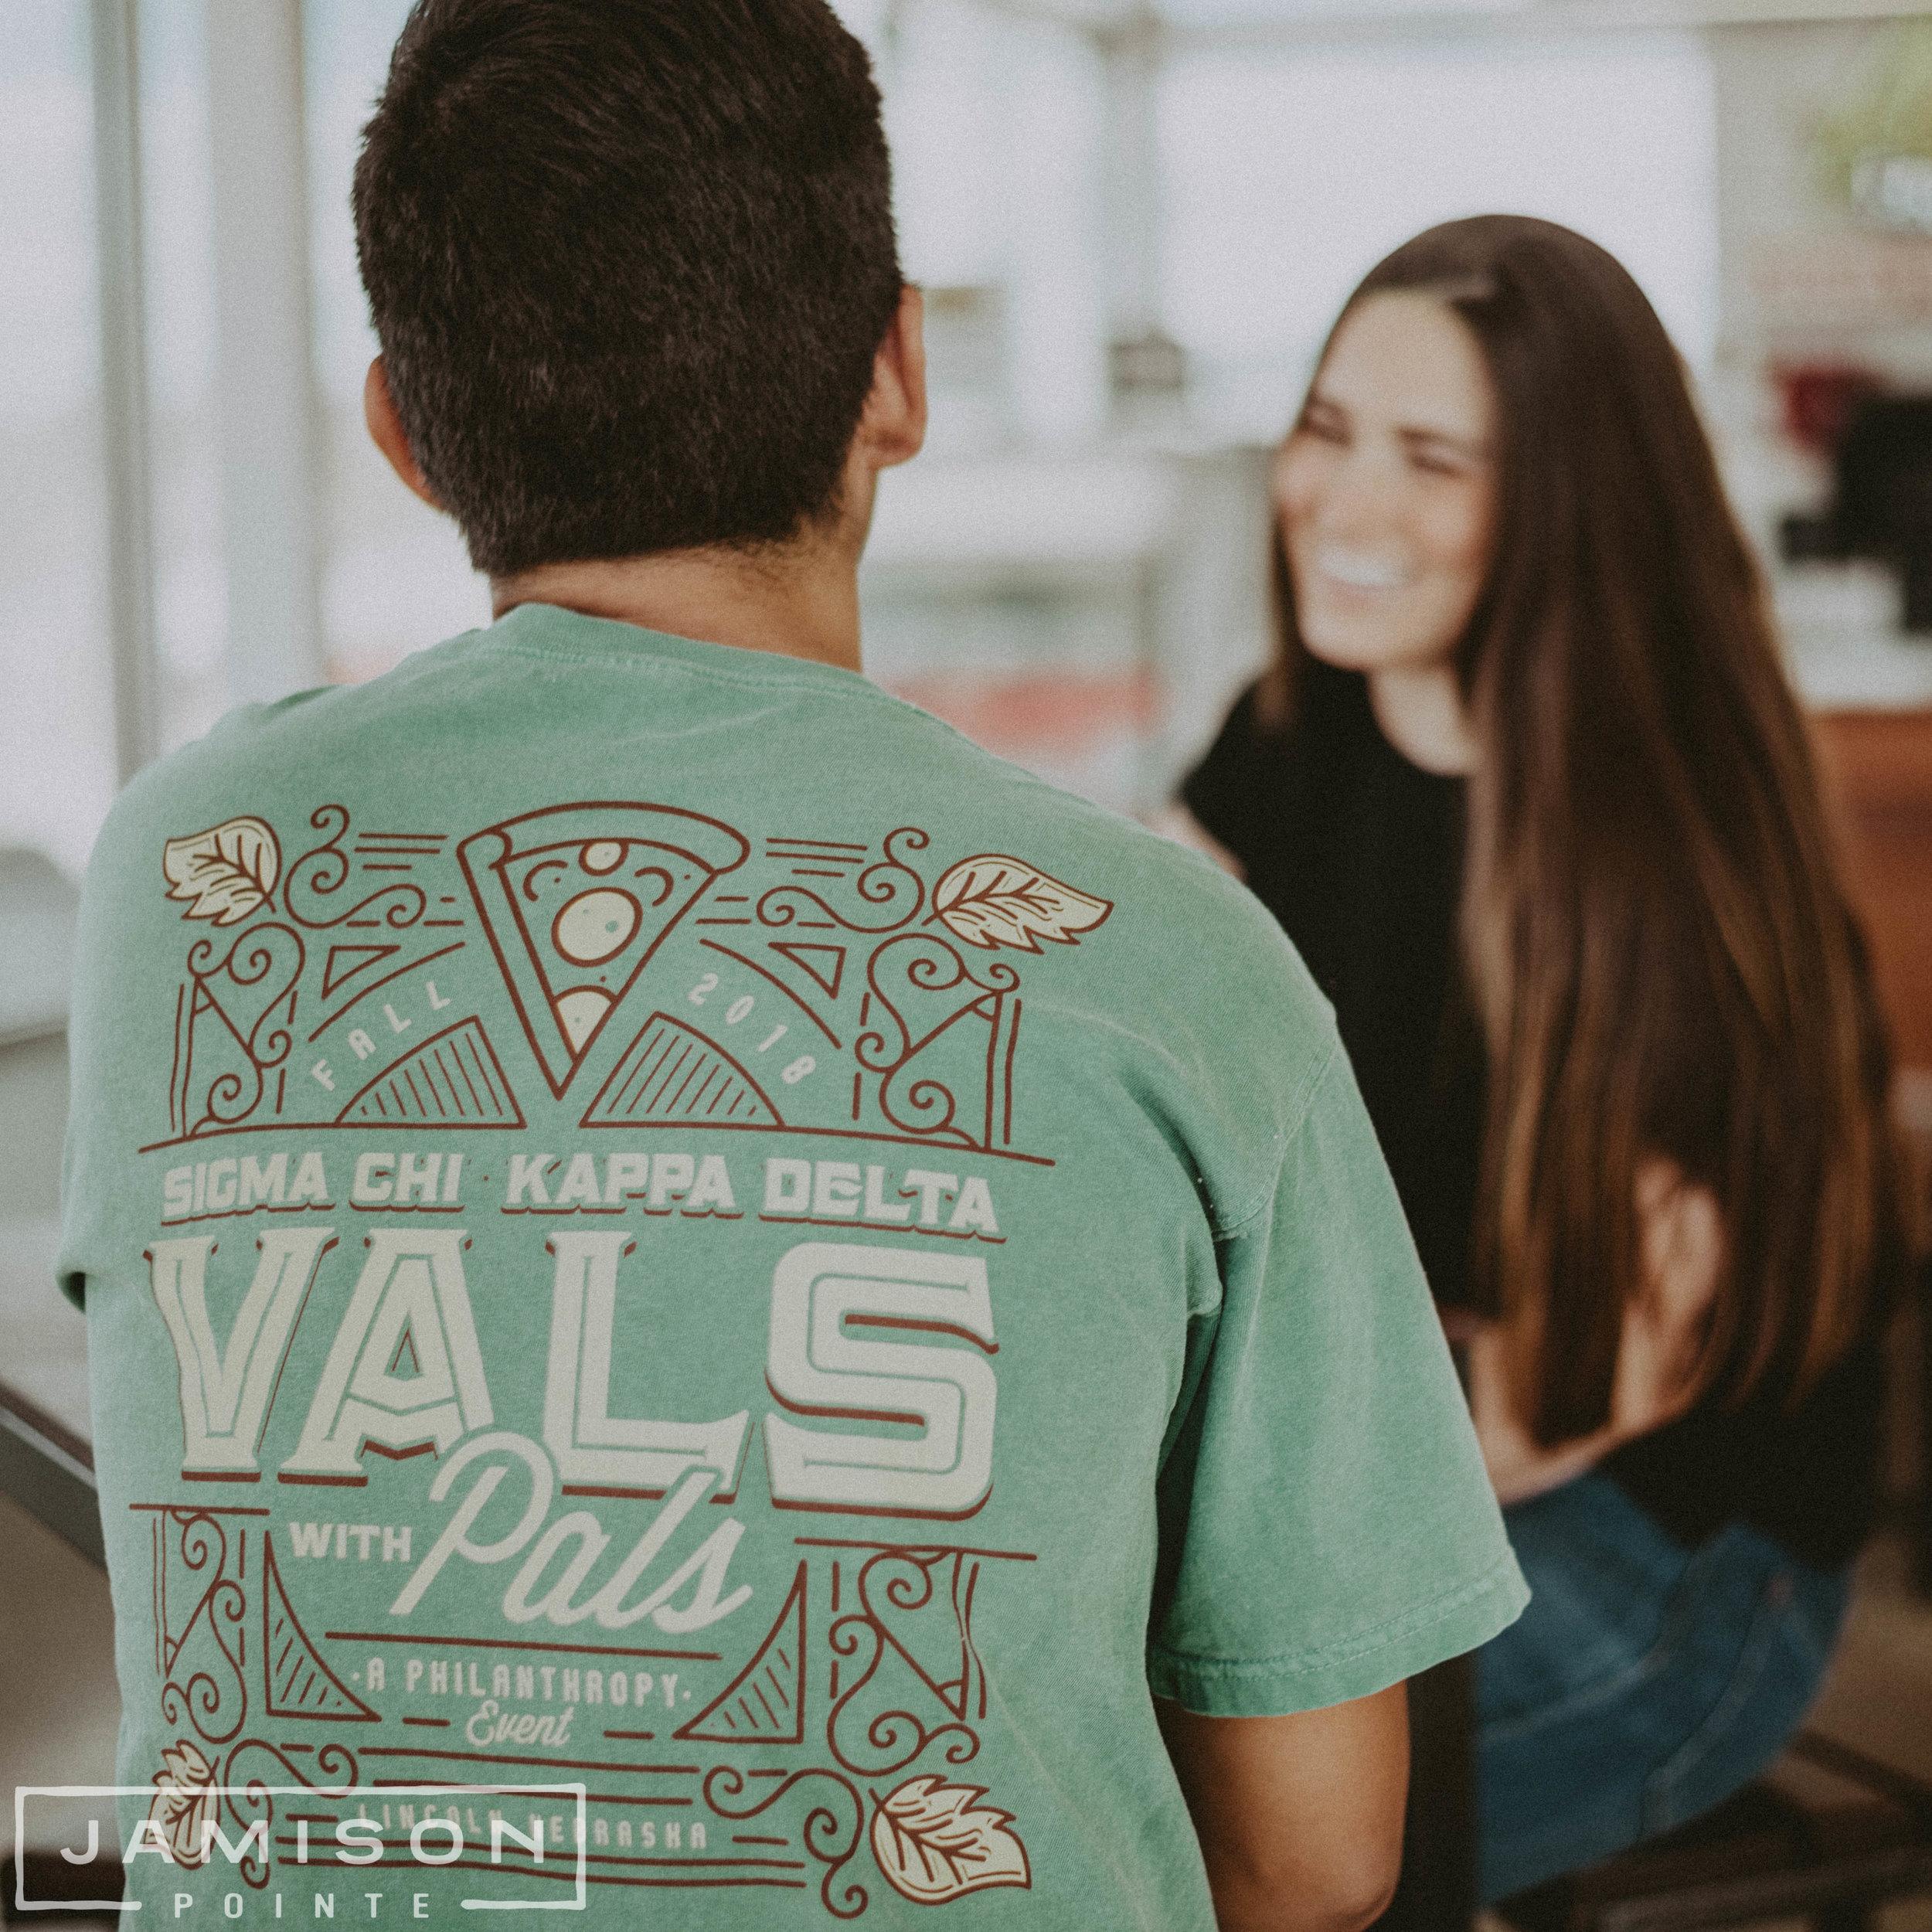 Sigma Chi Philanthropy T-shirt